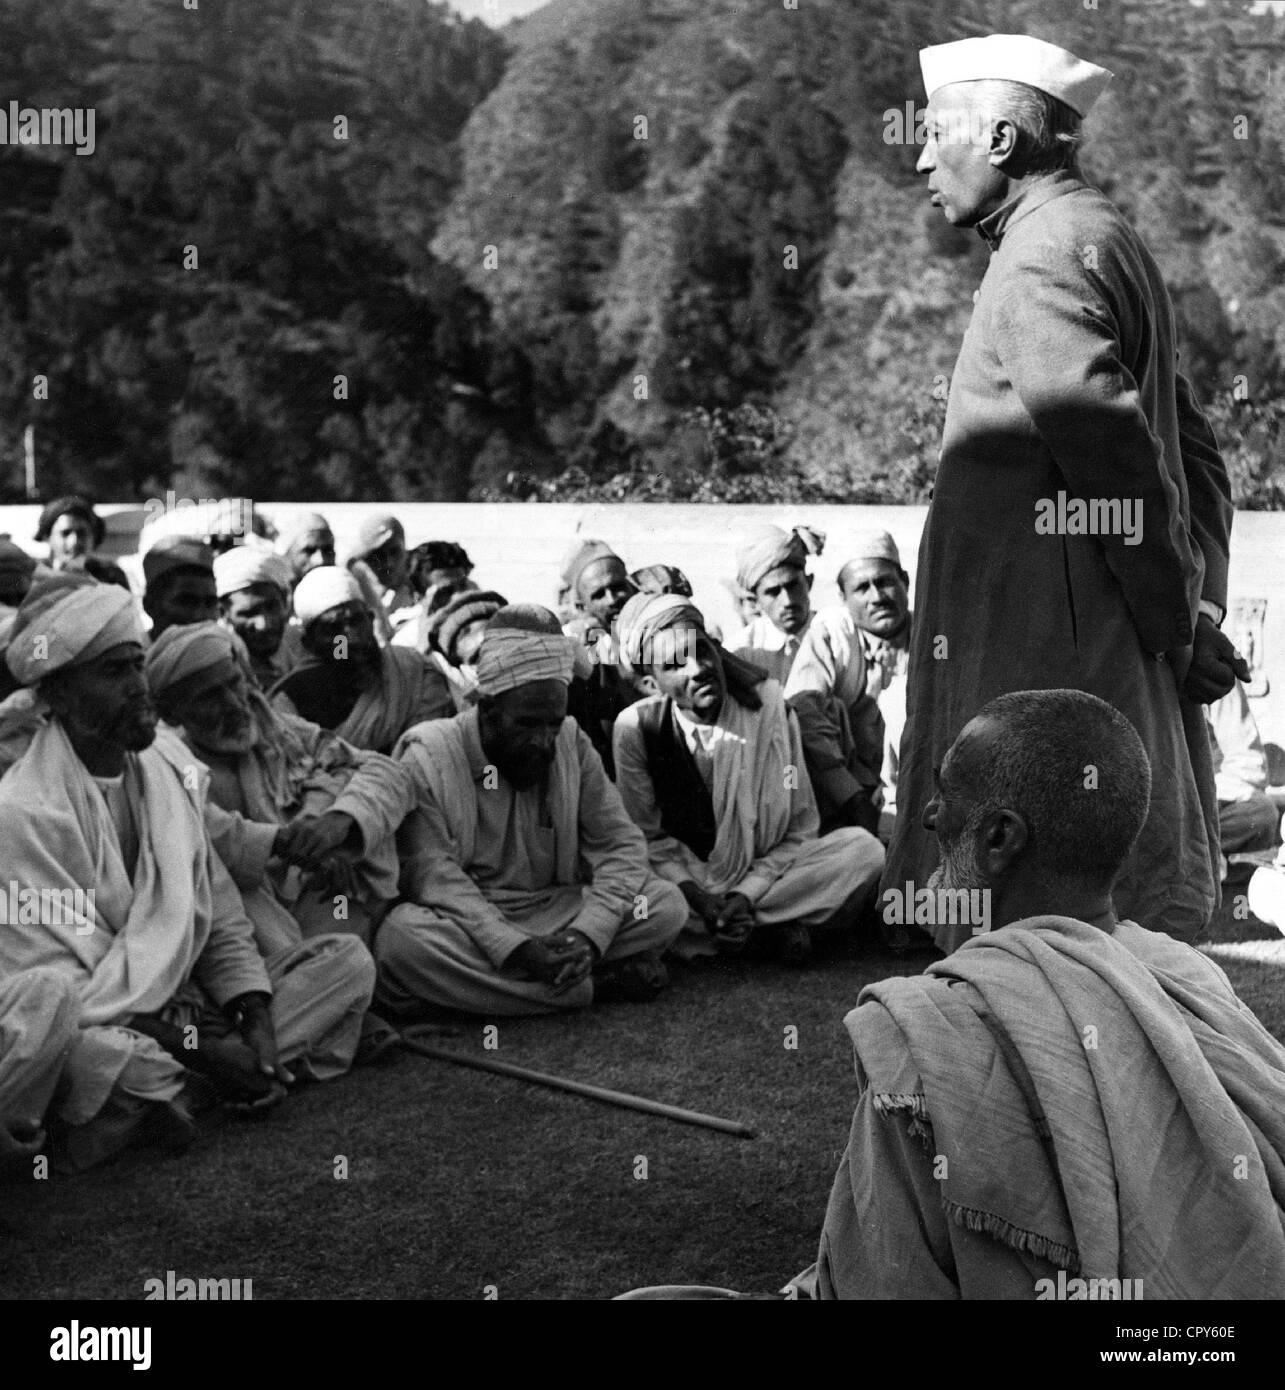 Nehru, Jawaharlal 'Pandit', 14.11.1889 - 27.5.1964, Indian politician, full length, visiting Pashtun people - Stock Image